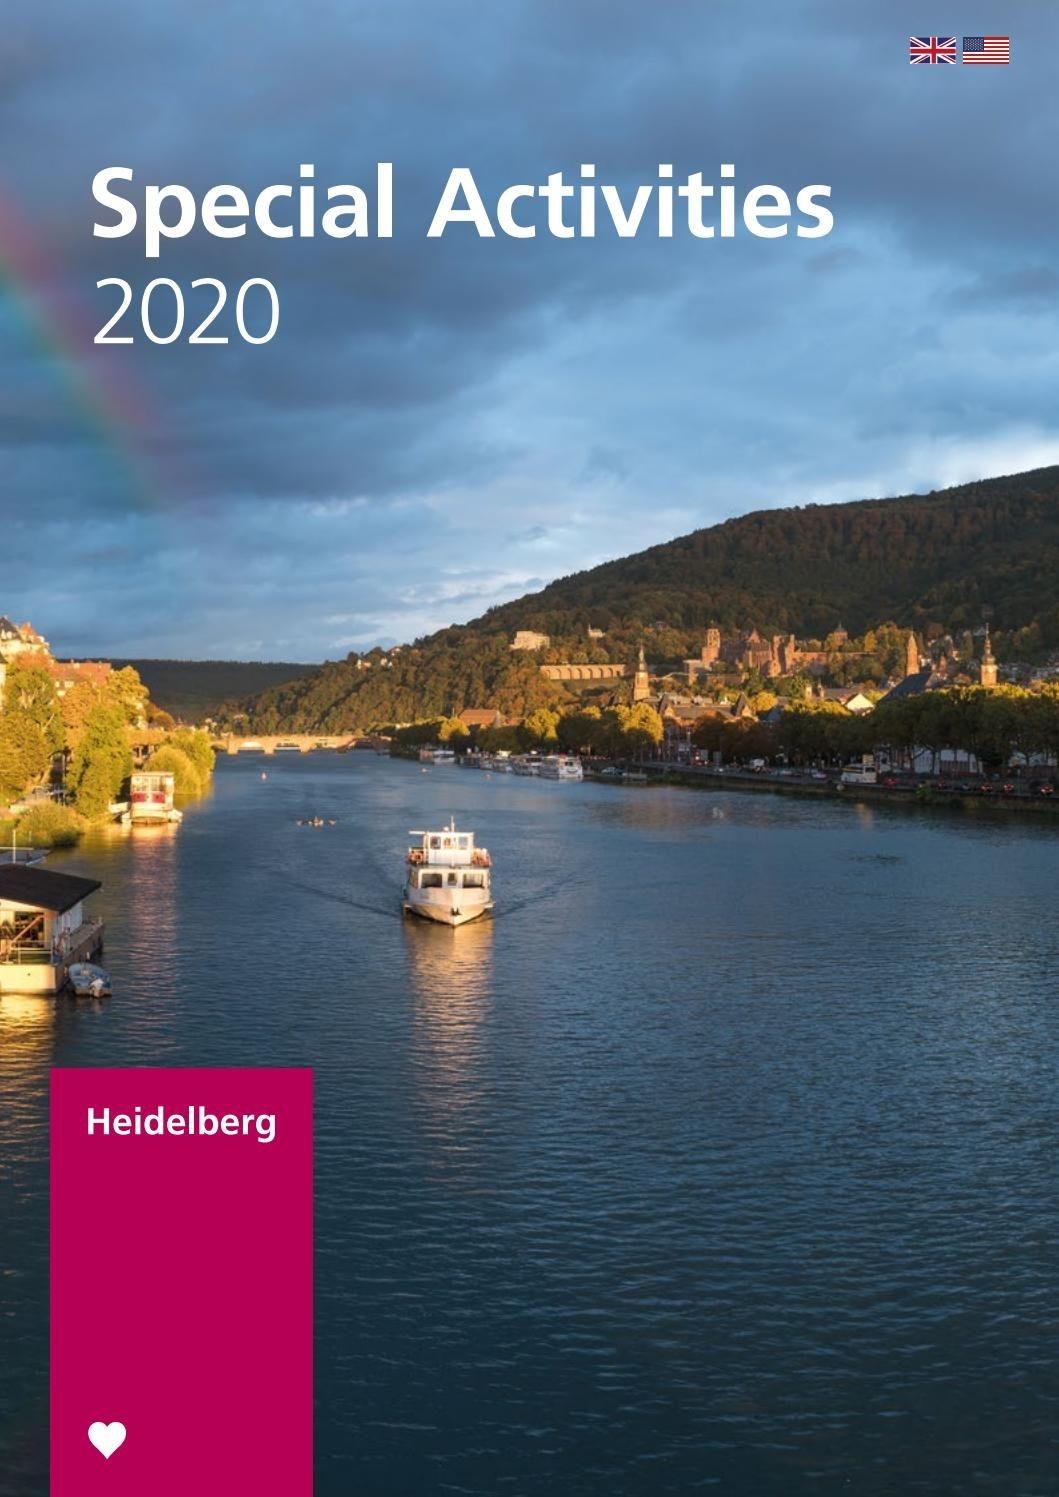 special activities 2020heidelberg 4 you issuu